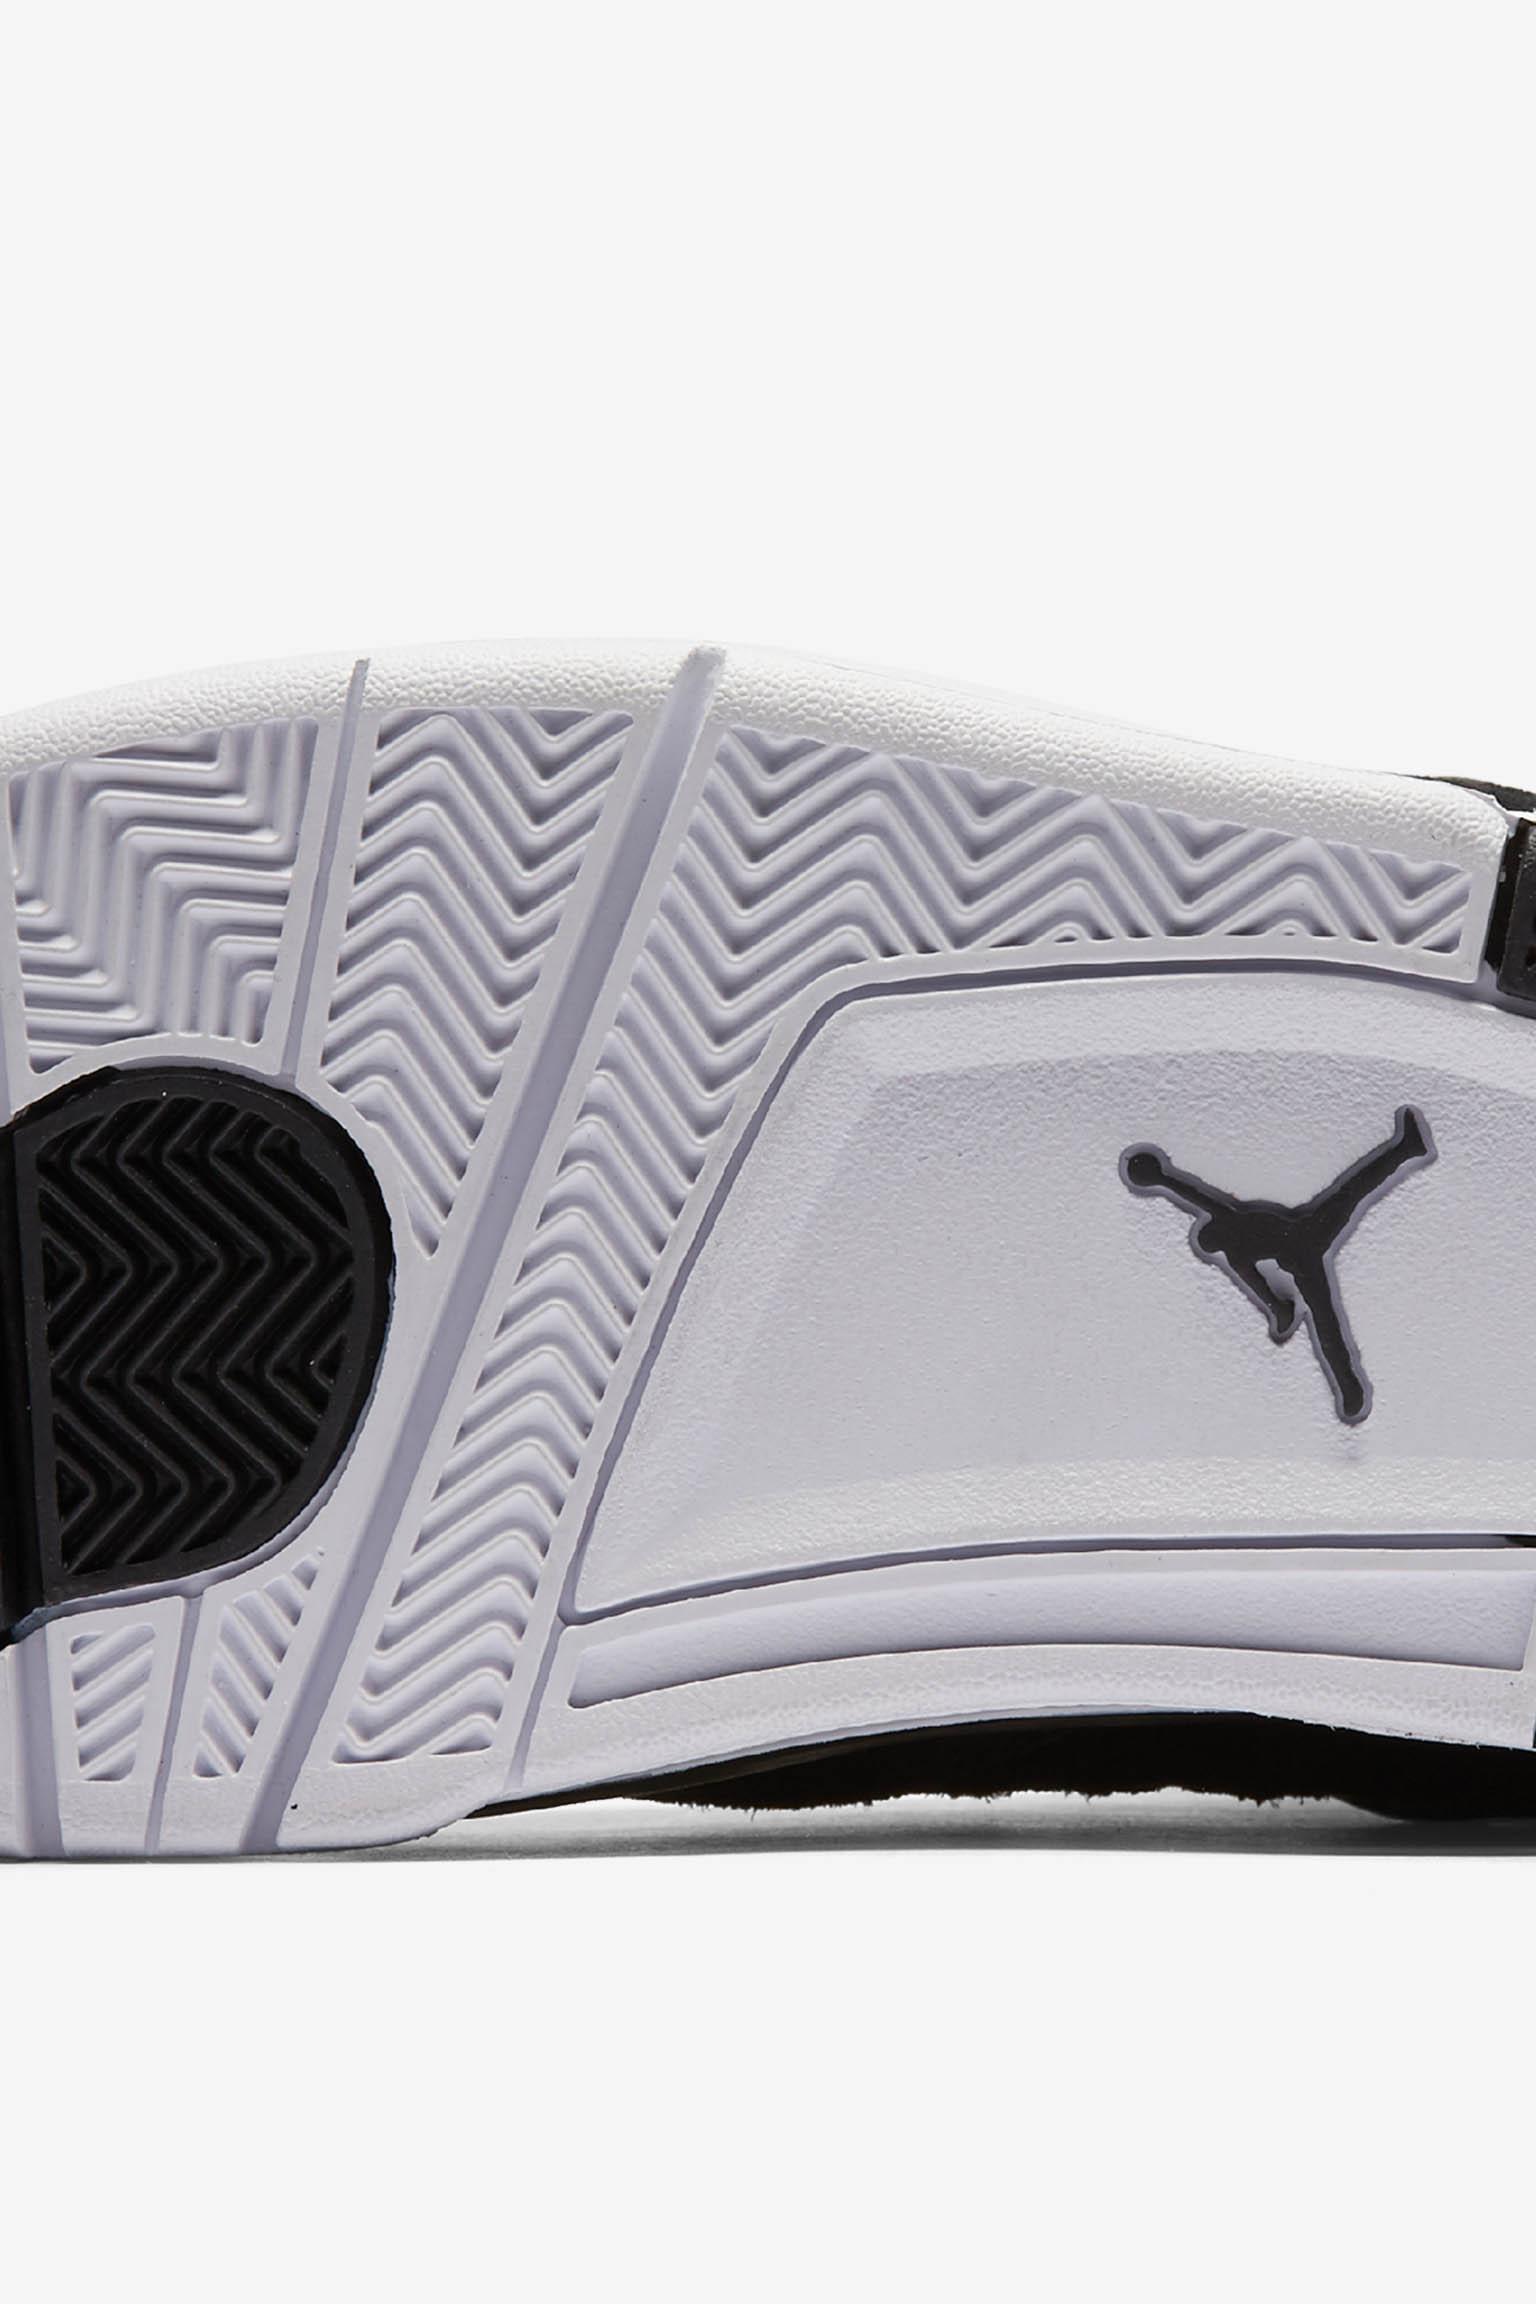 Air Jordan 4 Royalty 10